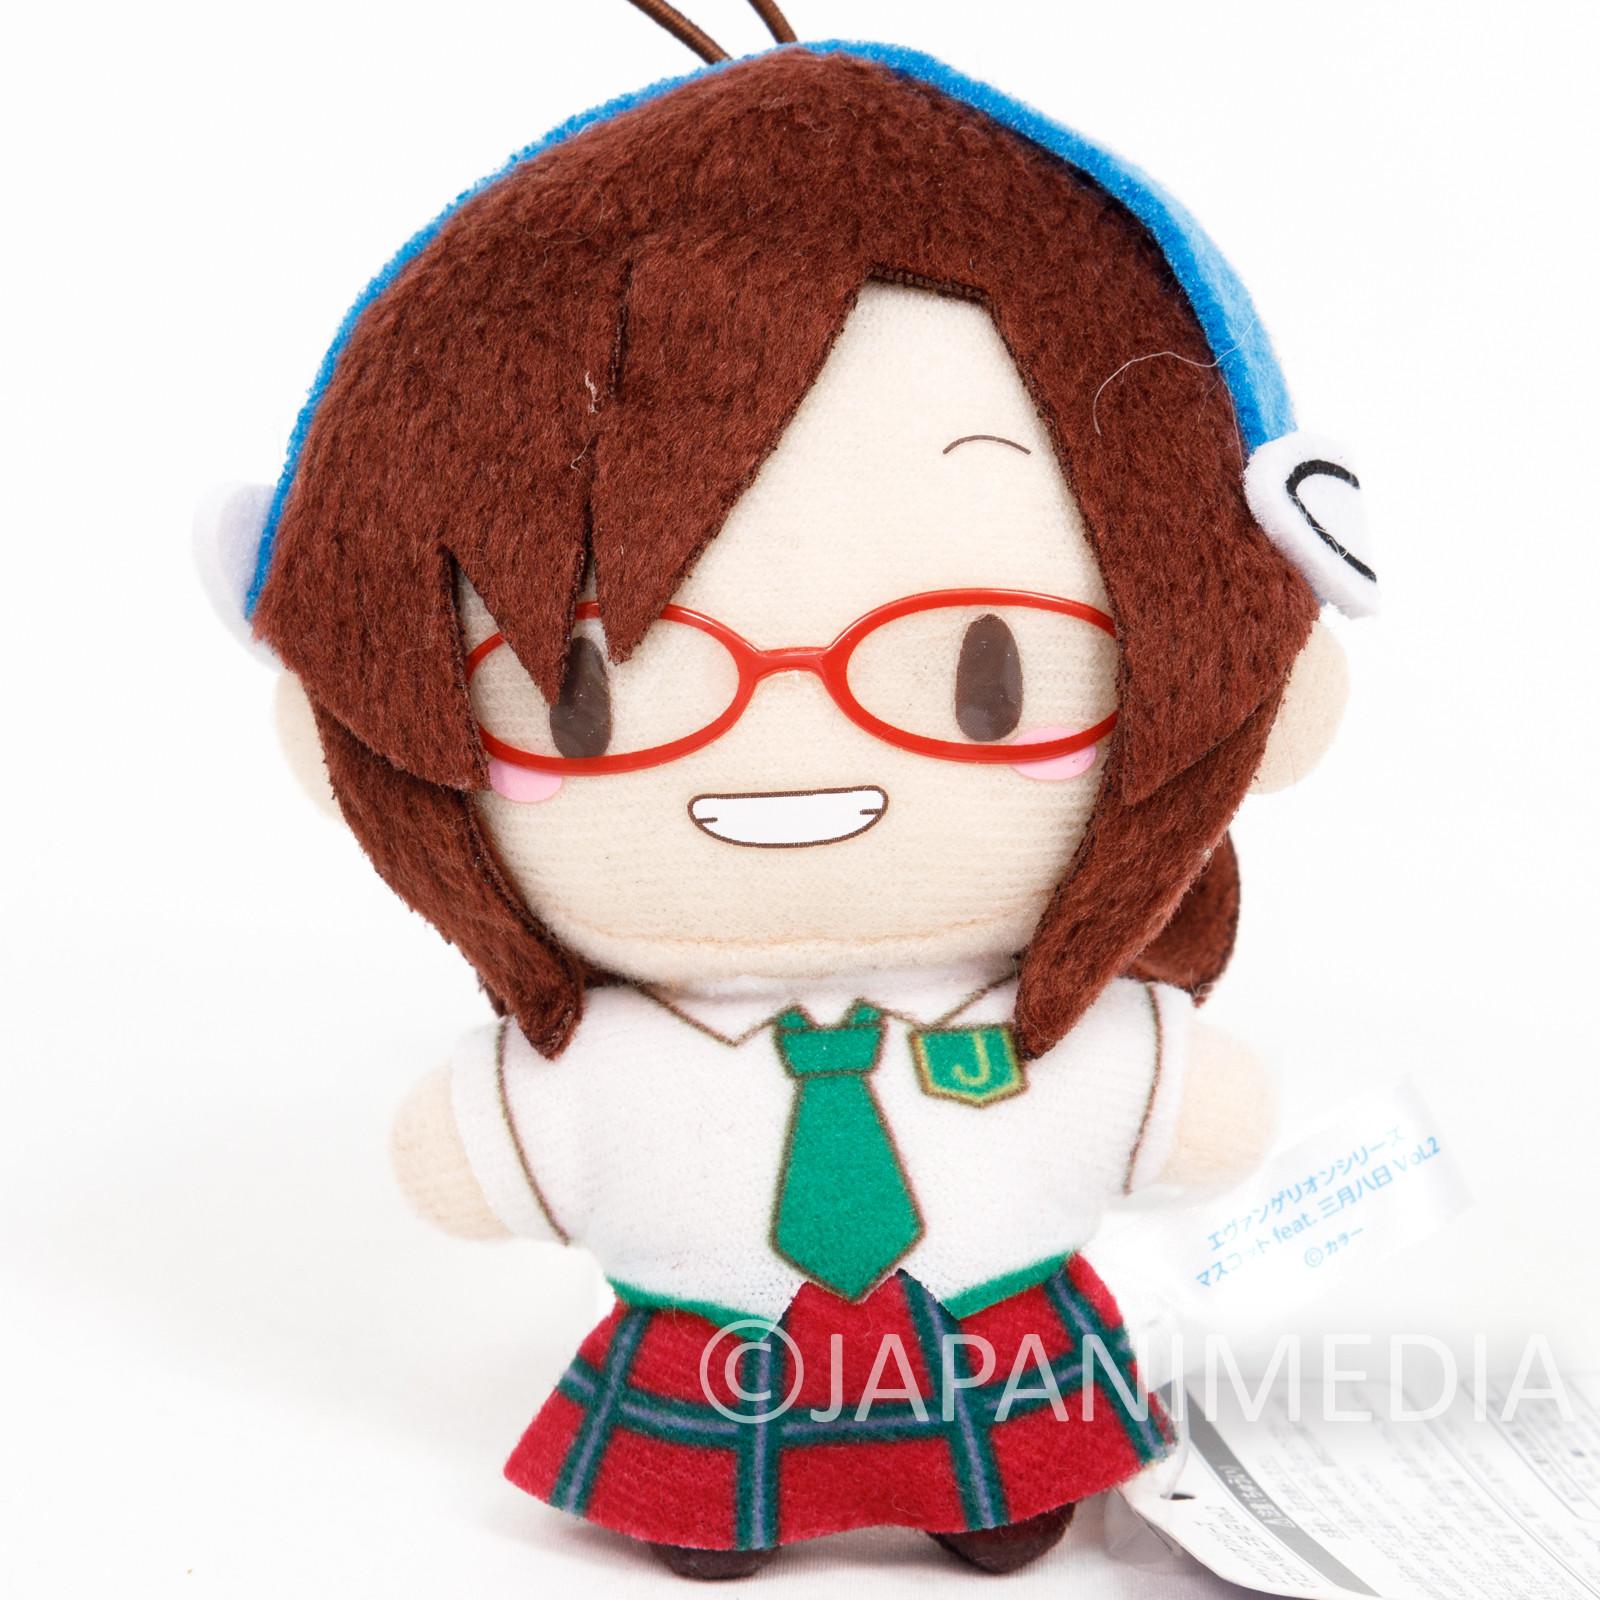 Evangelion Mari Illustrious School Uniform Mini Plush Doll SEGA JAPAN ANIME